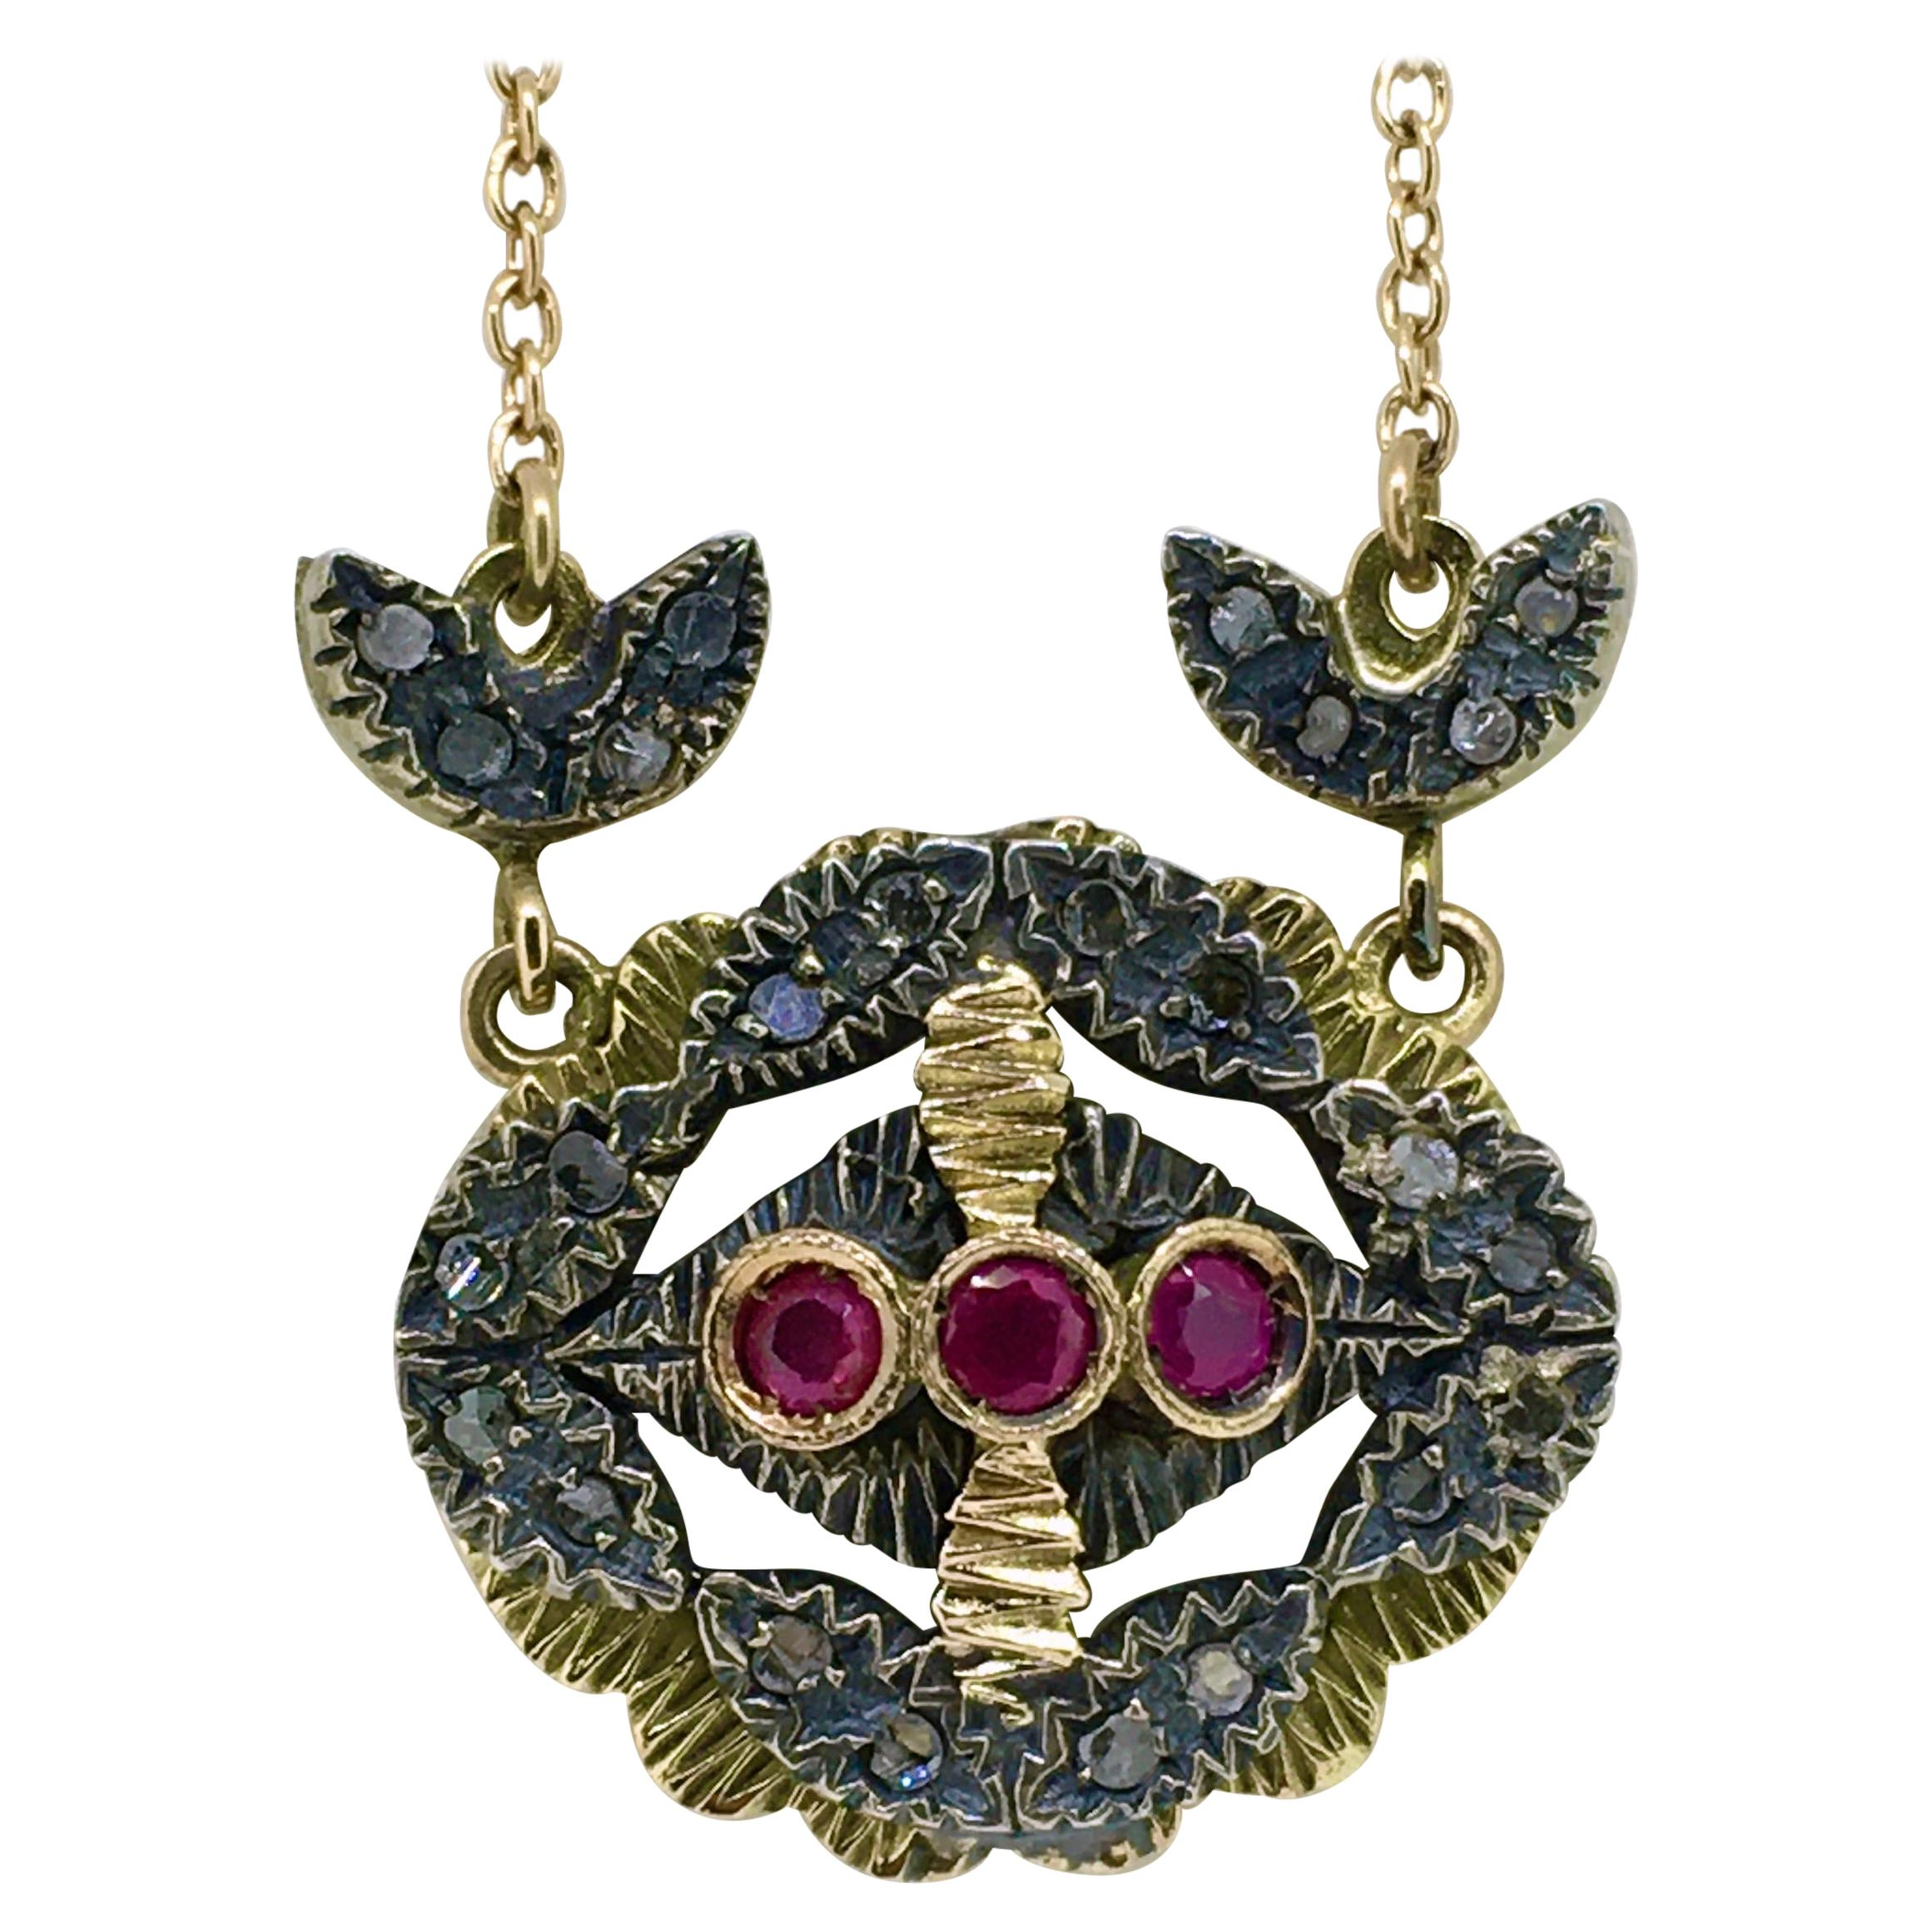 Pendant Necklace, Gold, Silver, Diamond, Ruby, Victorian